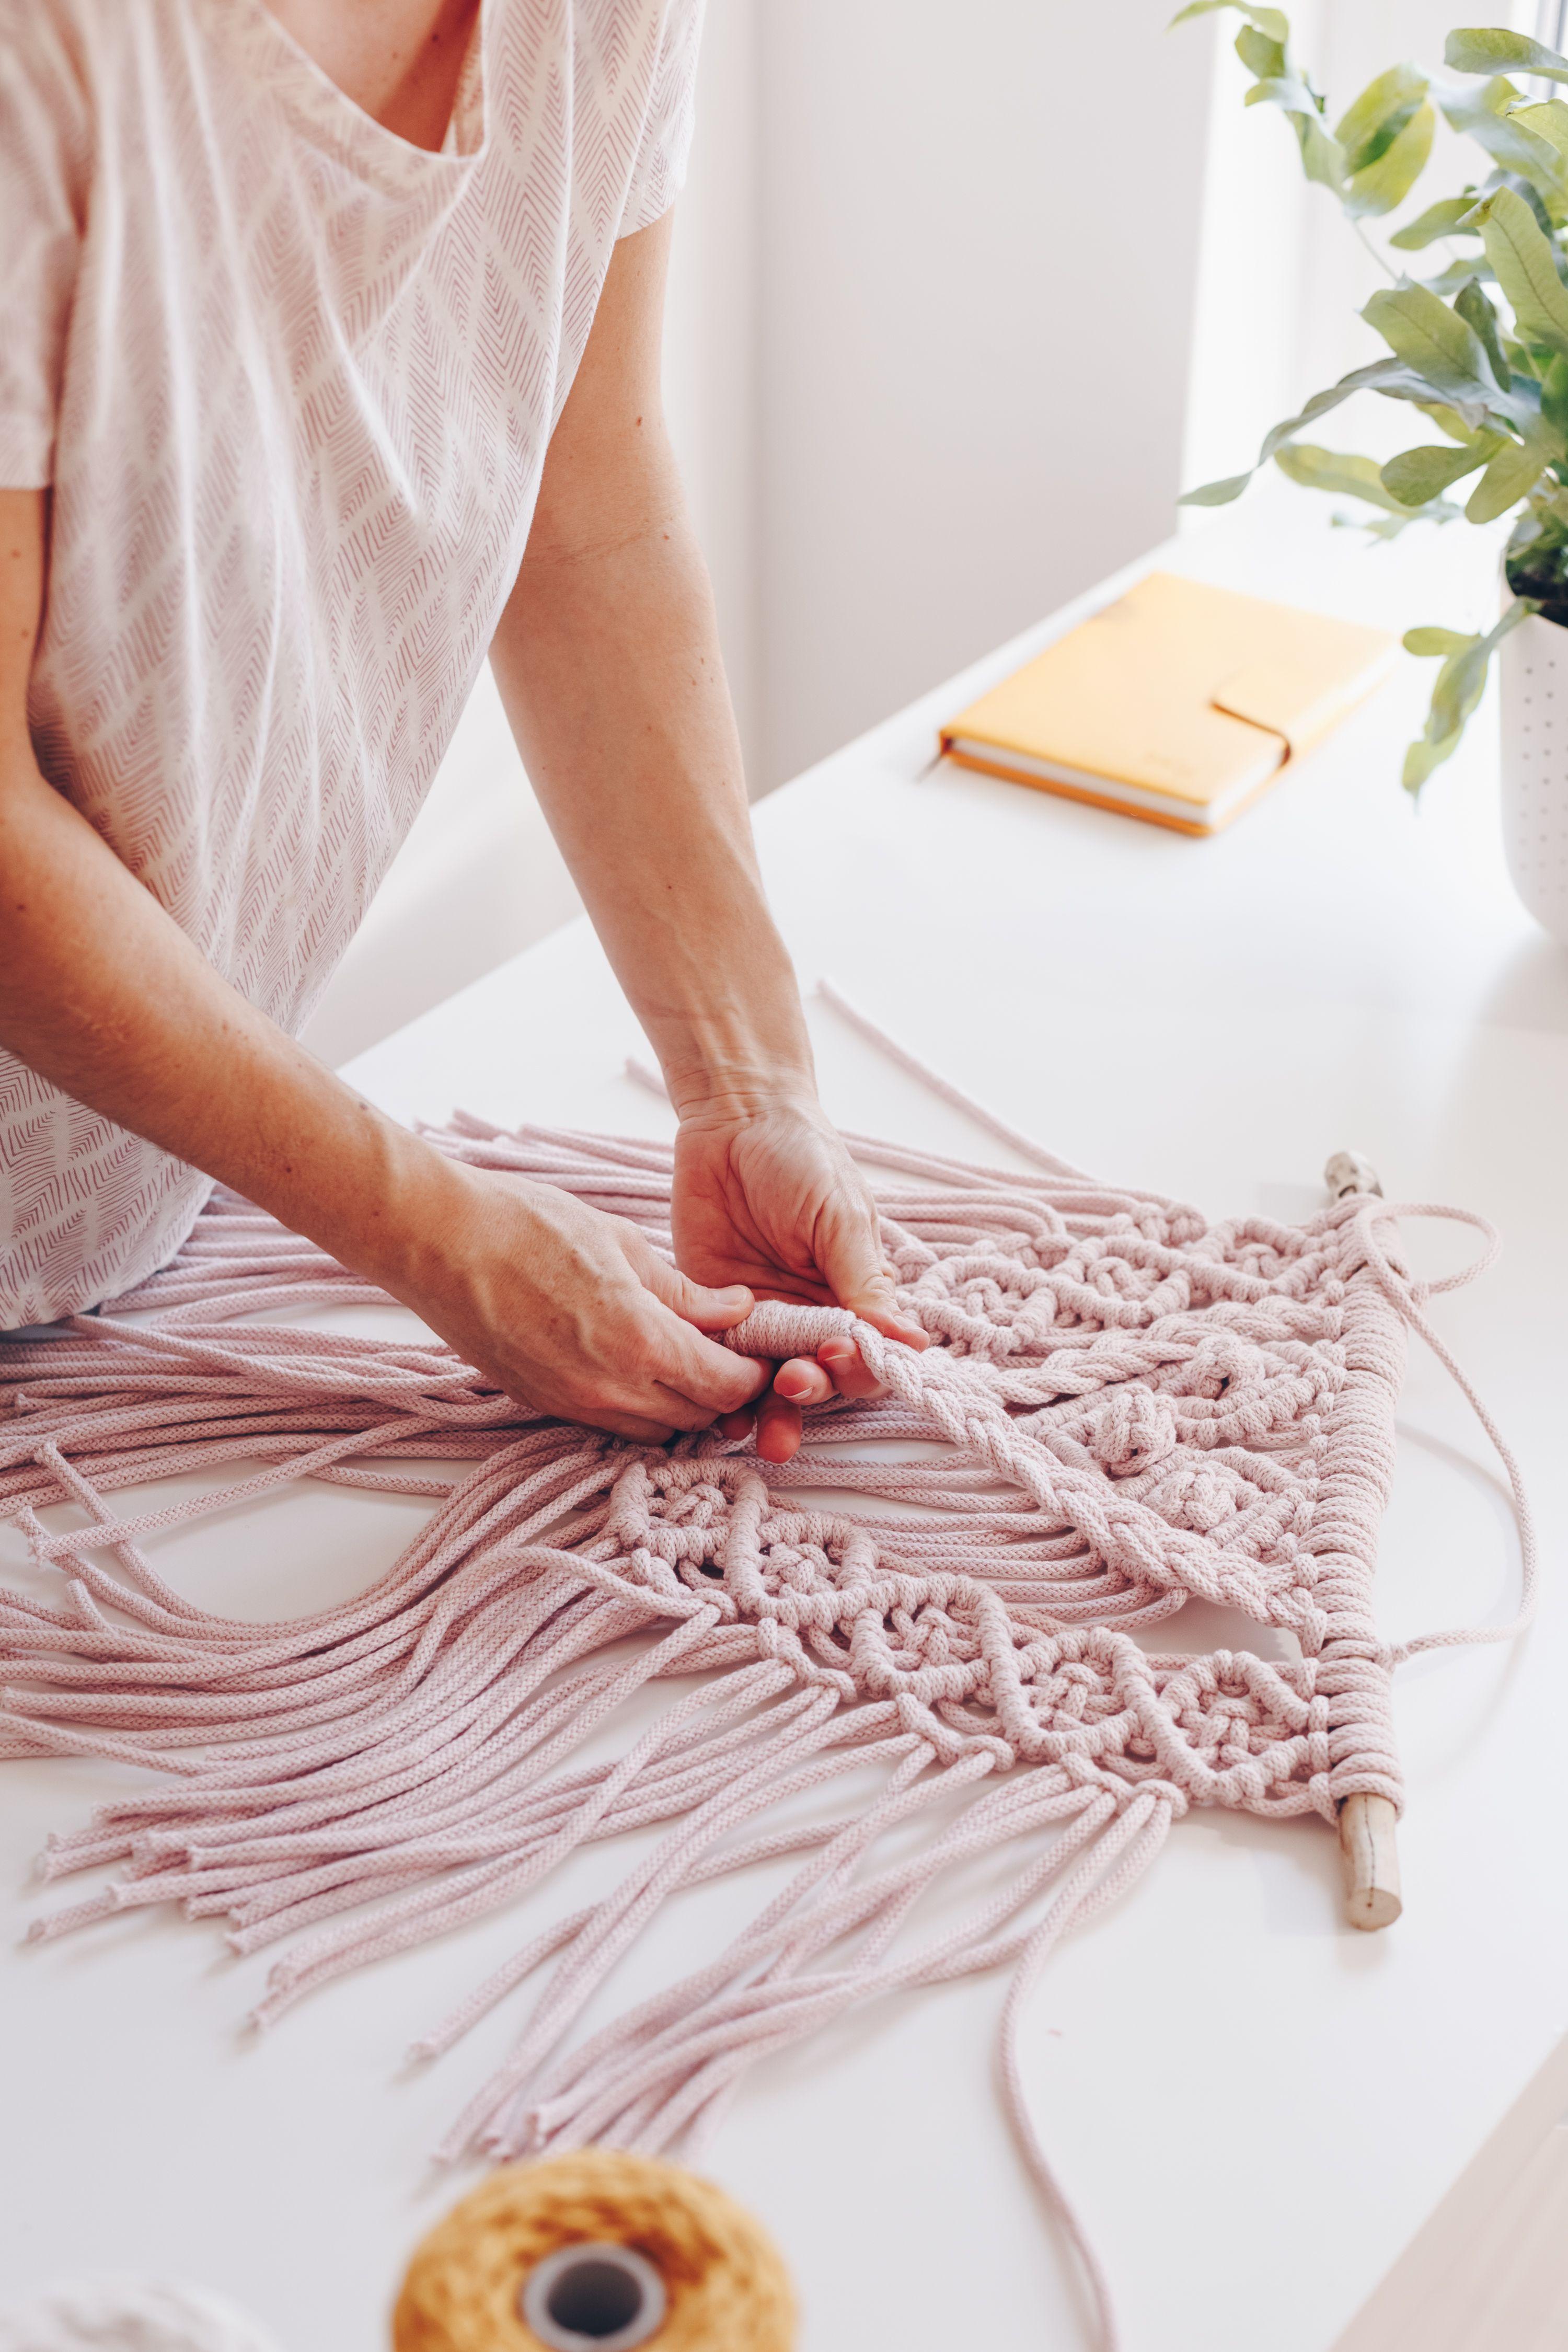 11 Unique At Home Craft Ideas To See You Through Quarantine